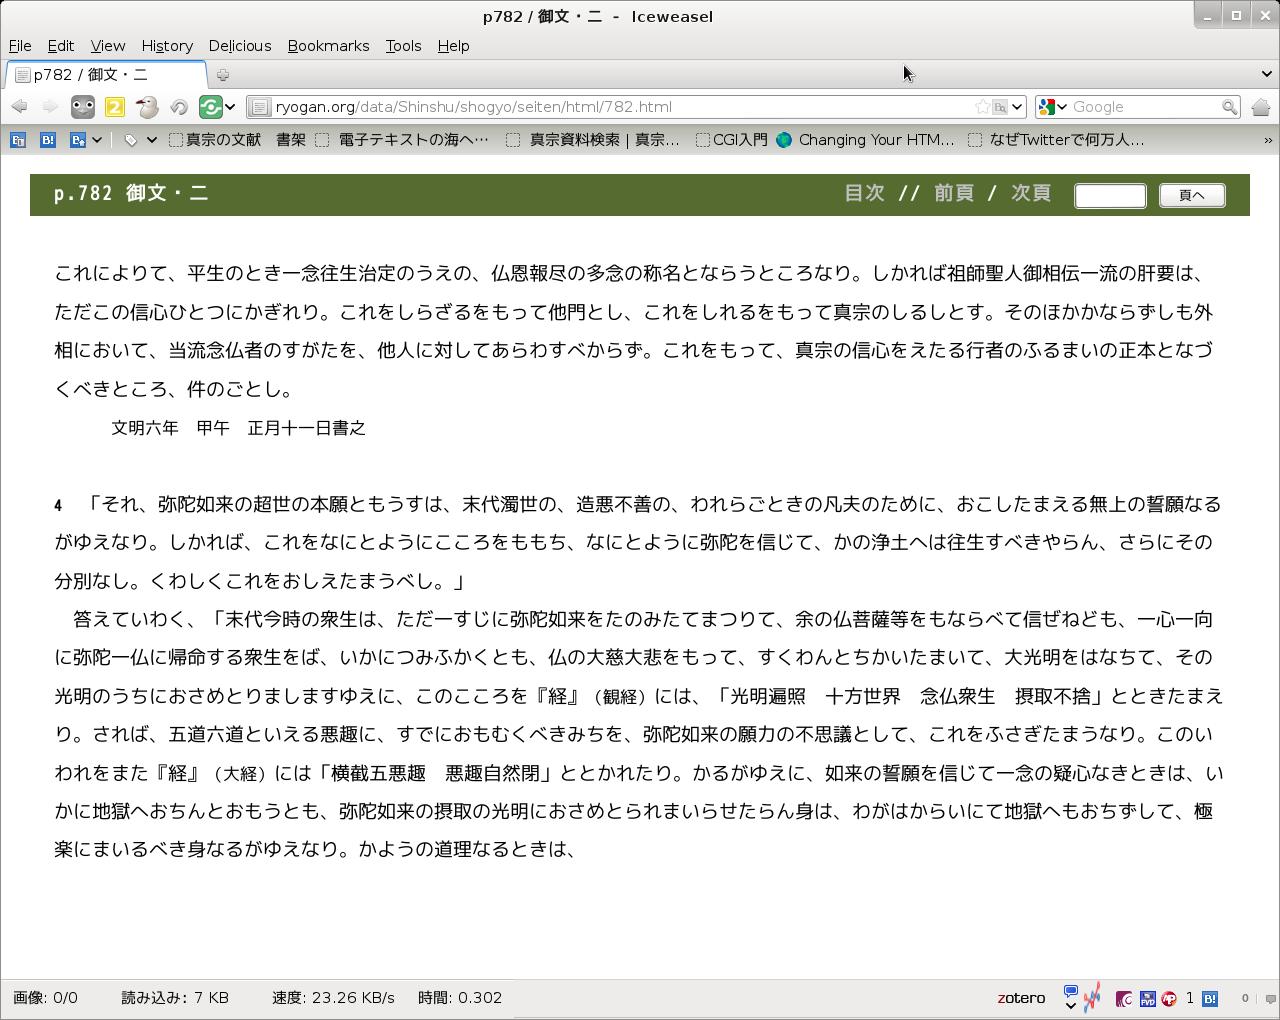 https://ryogan.org/blog/wp-content/uploads/2012/04/wpid-shinshu_search_02.png